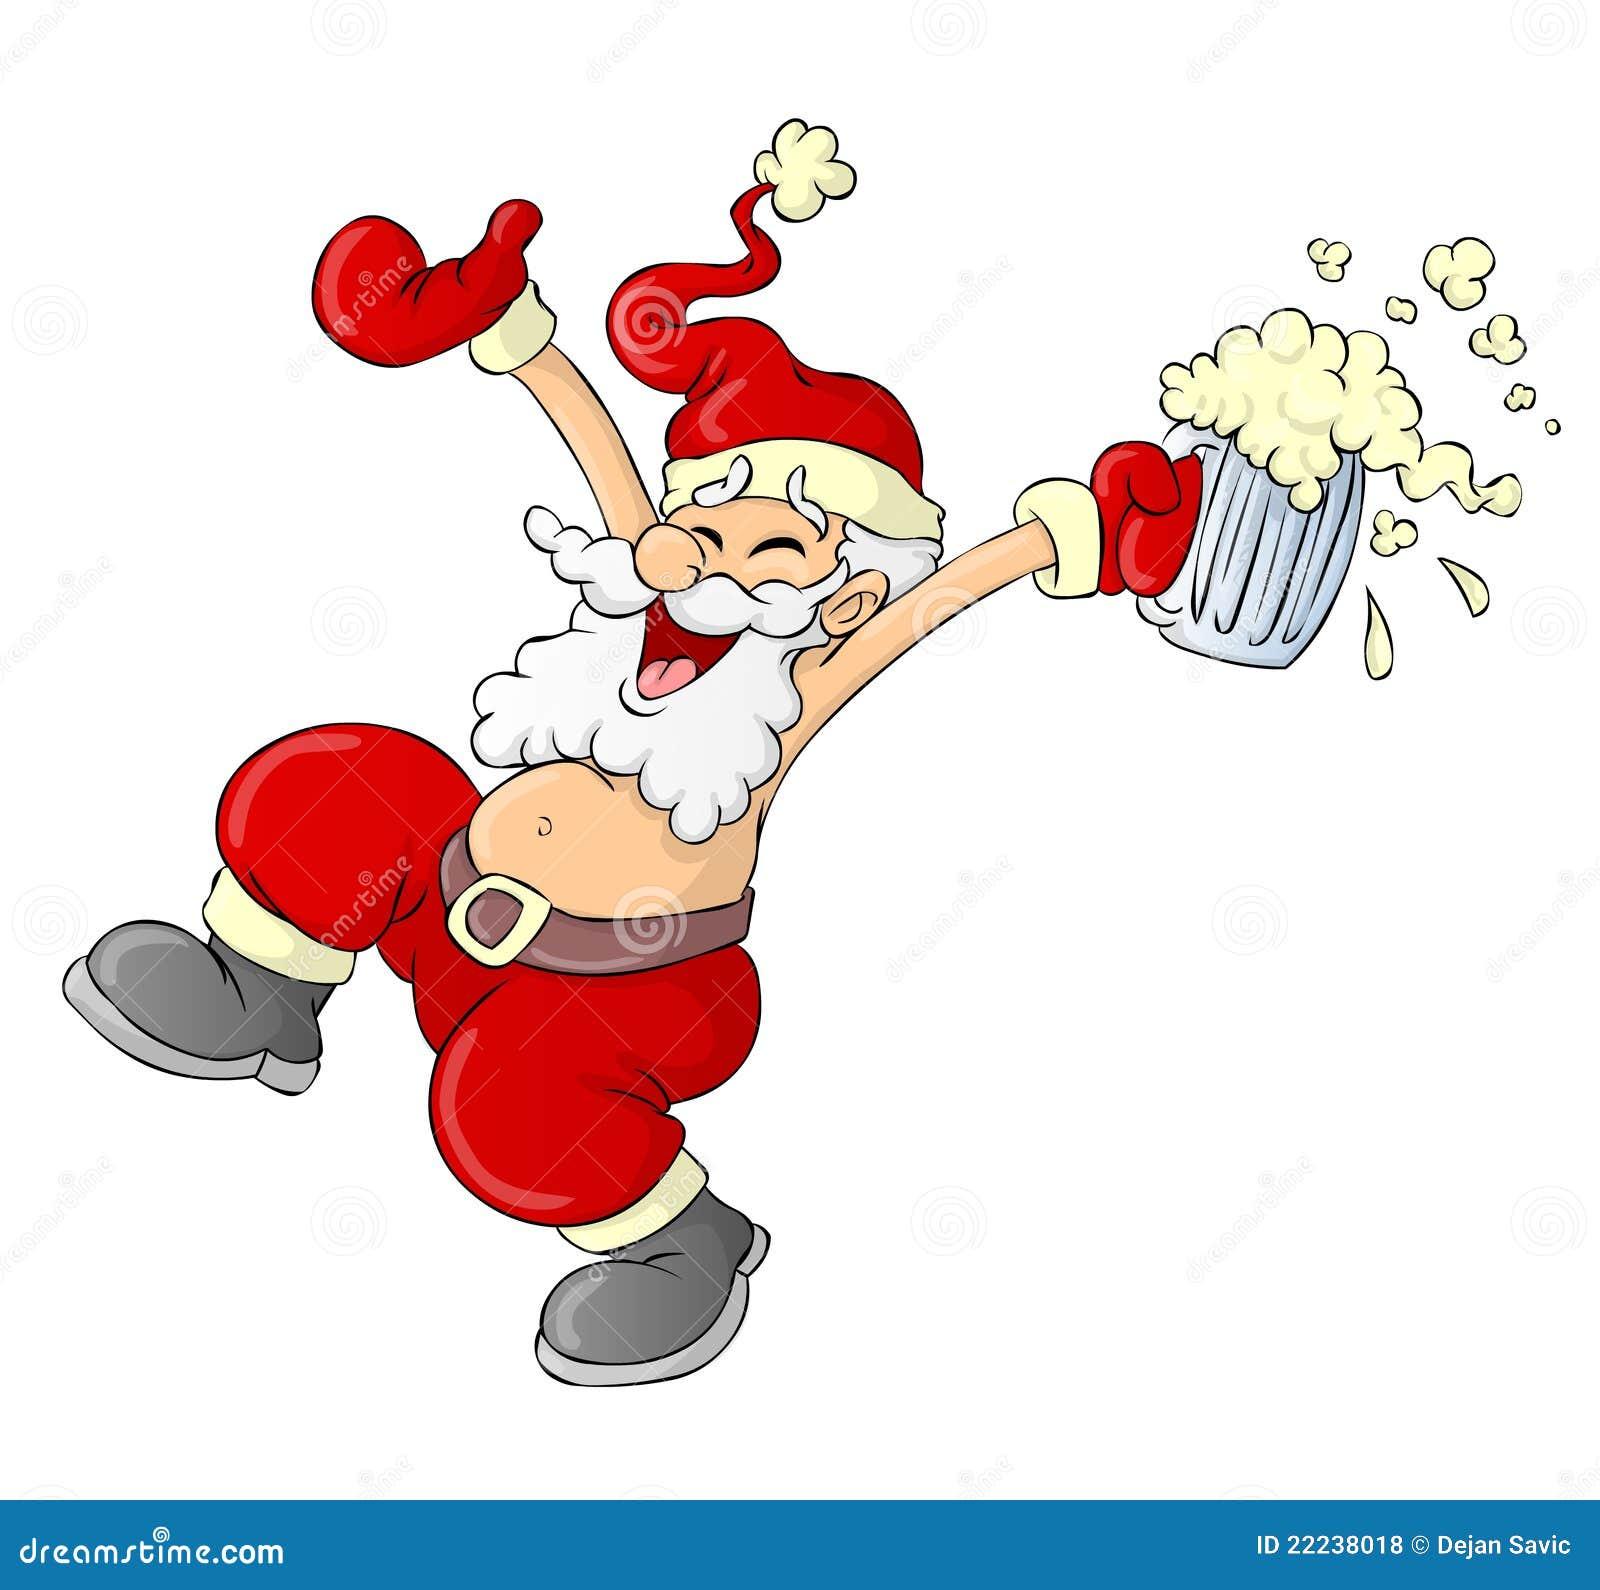 Babbo Natale Ubriaco.Babbo Natale Ubriaco Disegno Campobassopellicce